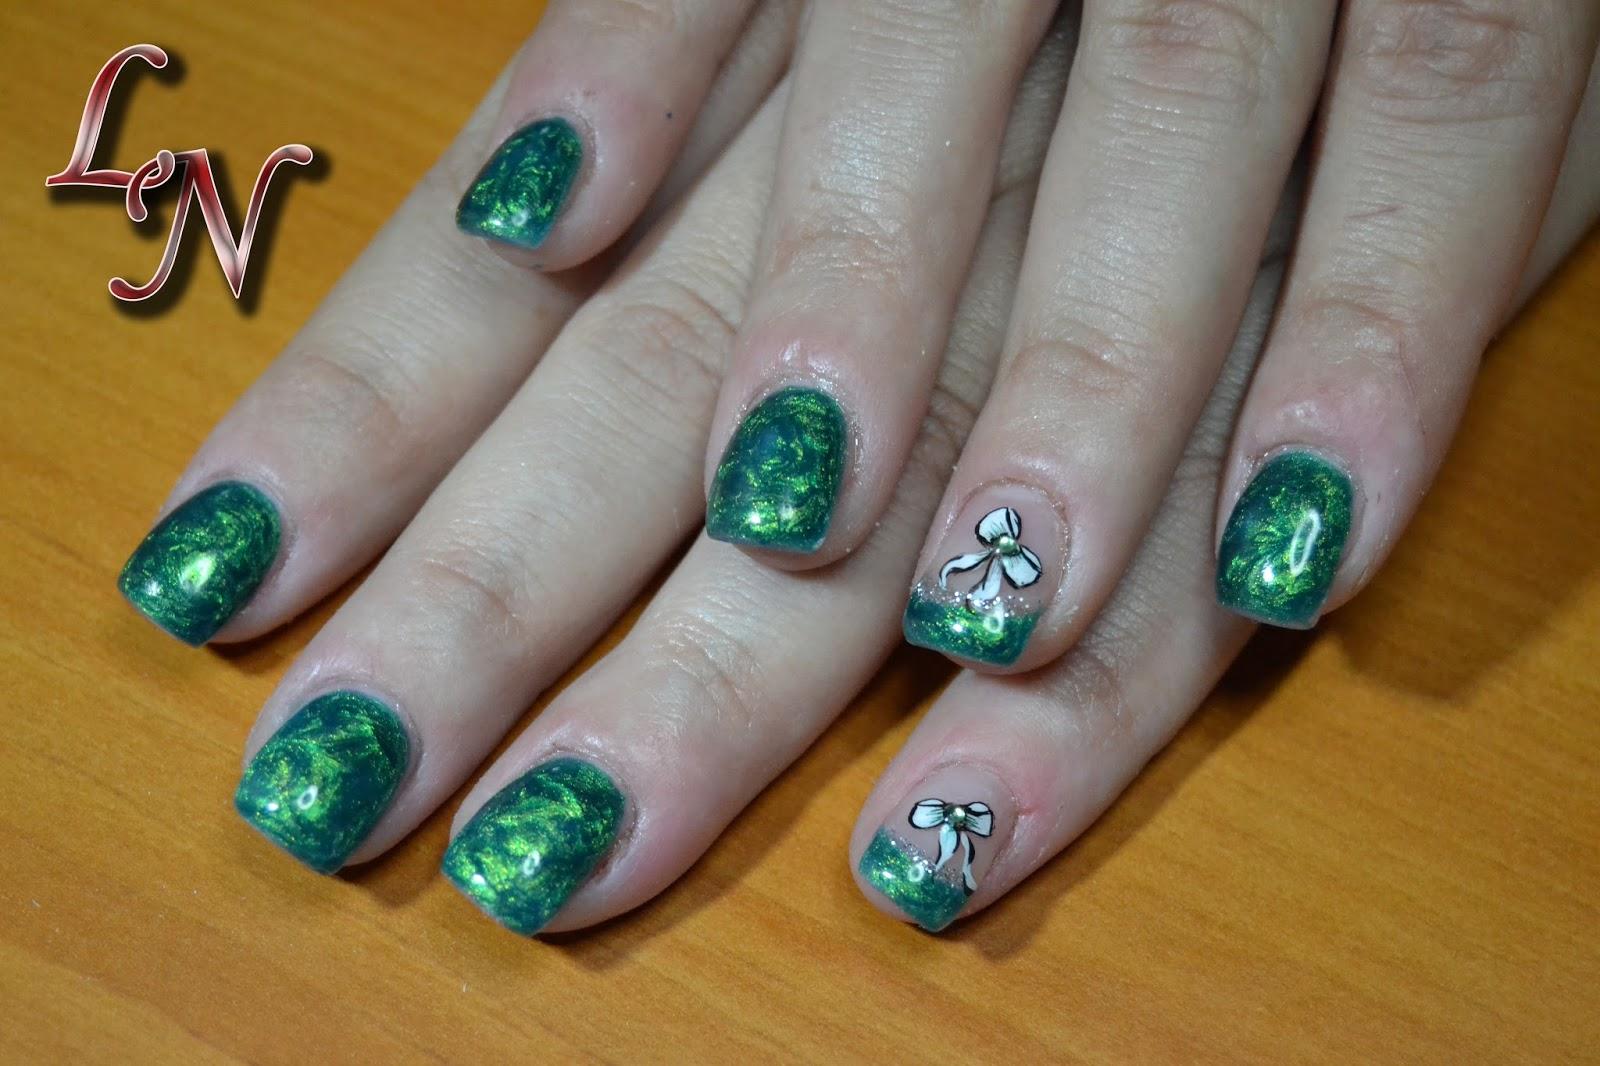 nail art su french in micropittura con strass in tinta